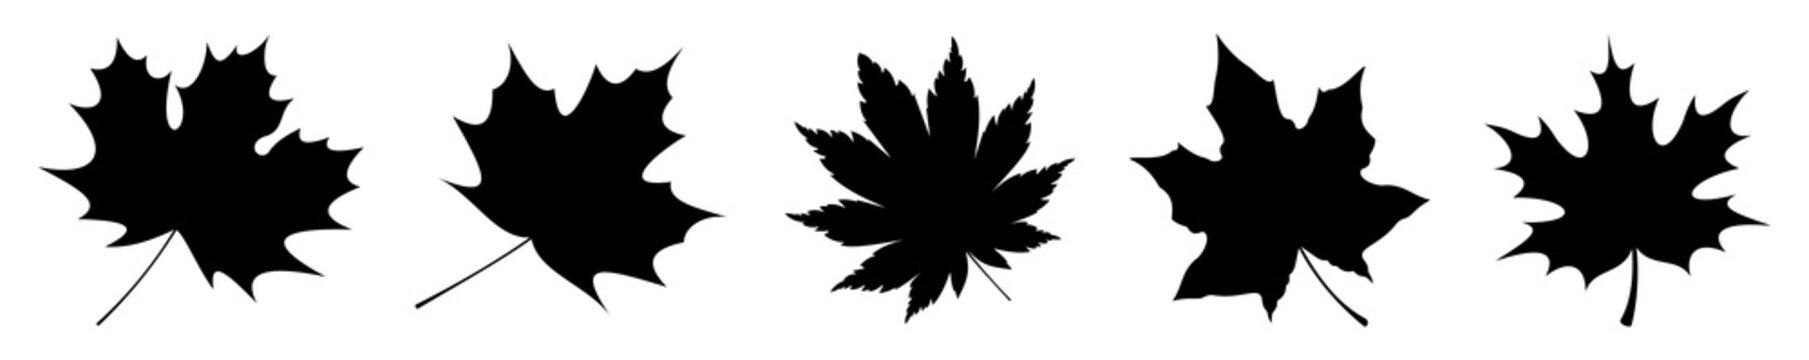 Silhouettes leaf maple icon, set. Vector, illustration